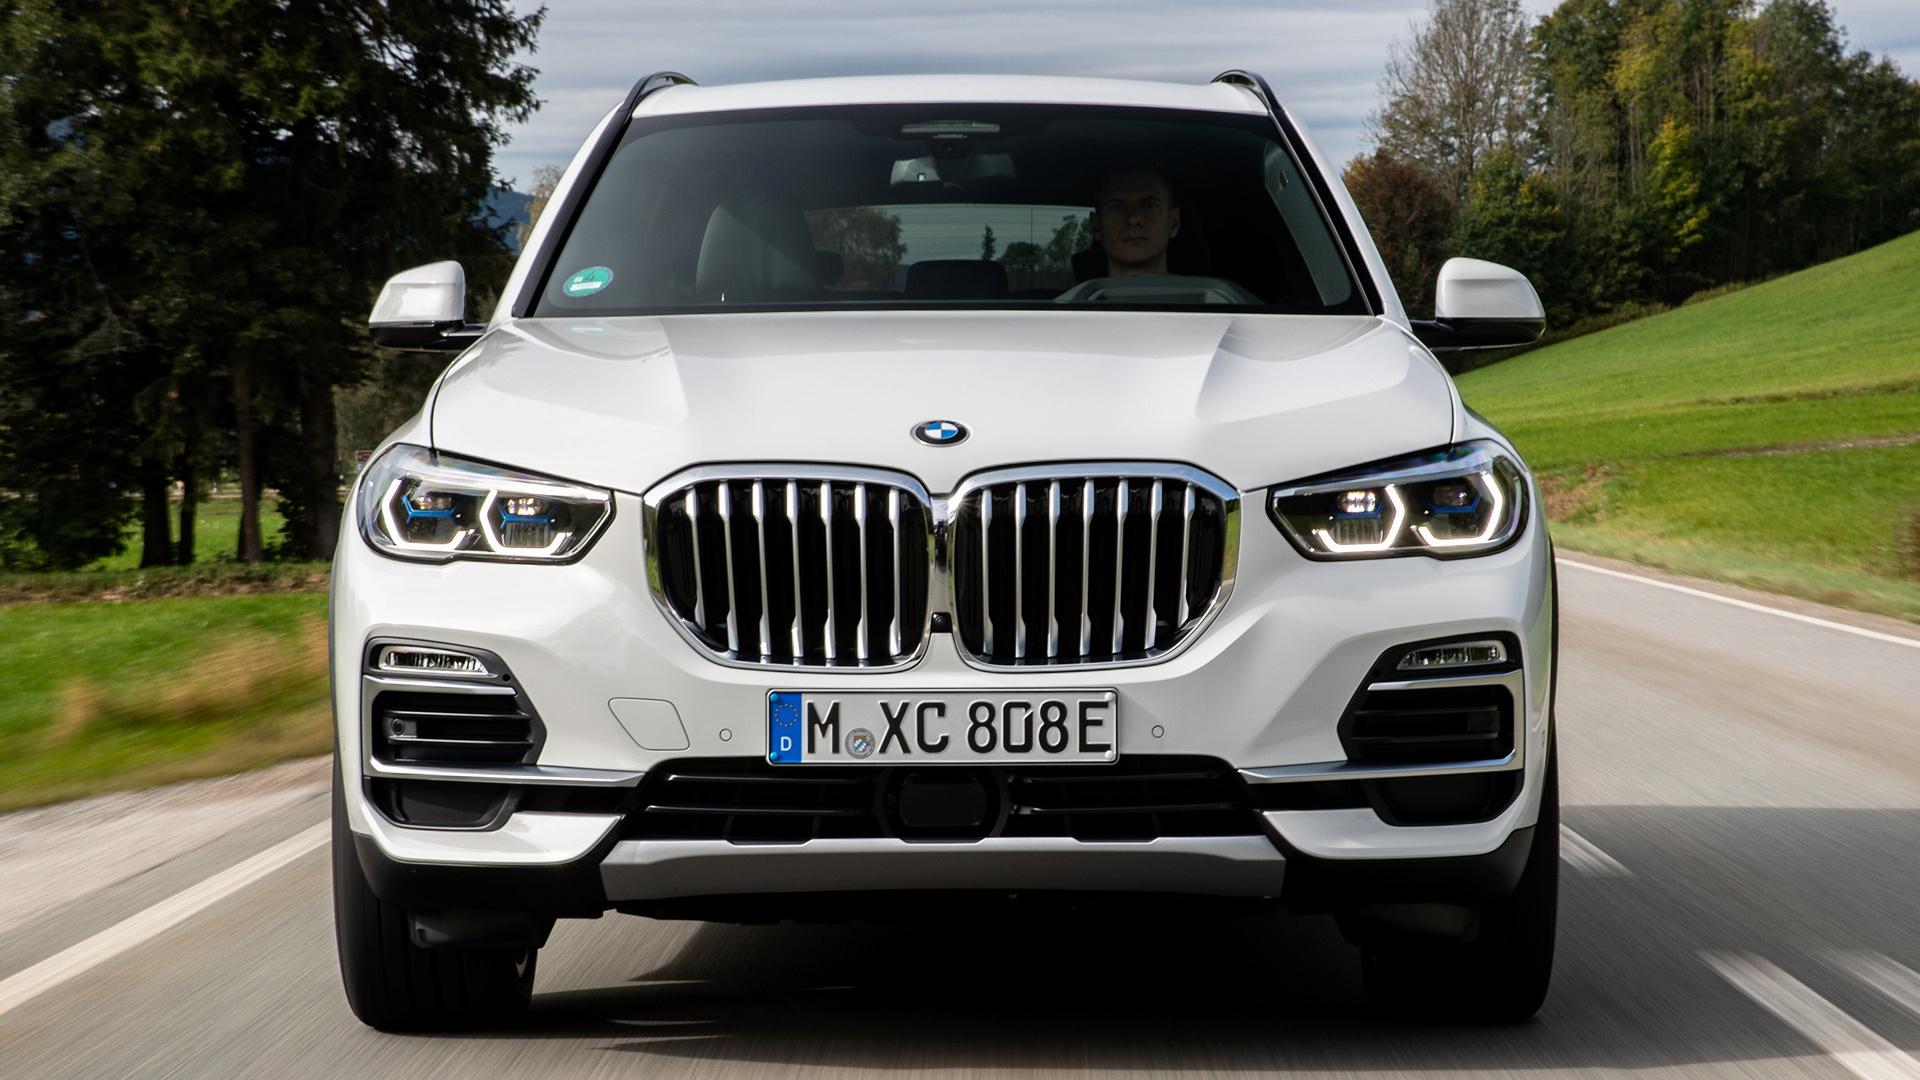 Bmw x5 hybrid 2019